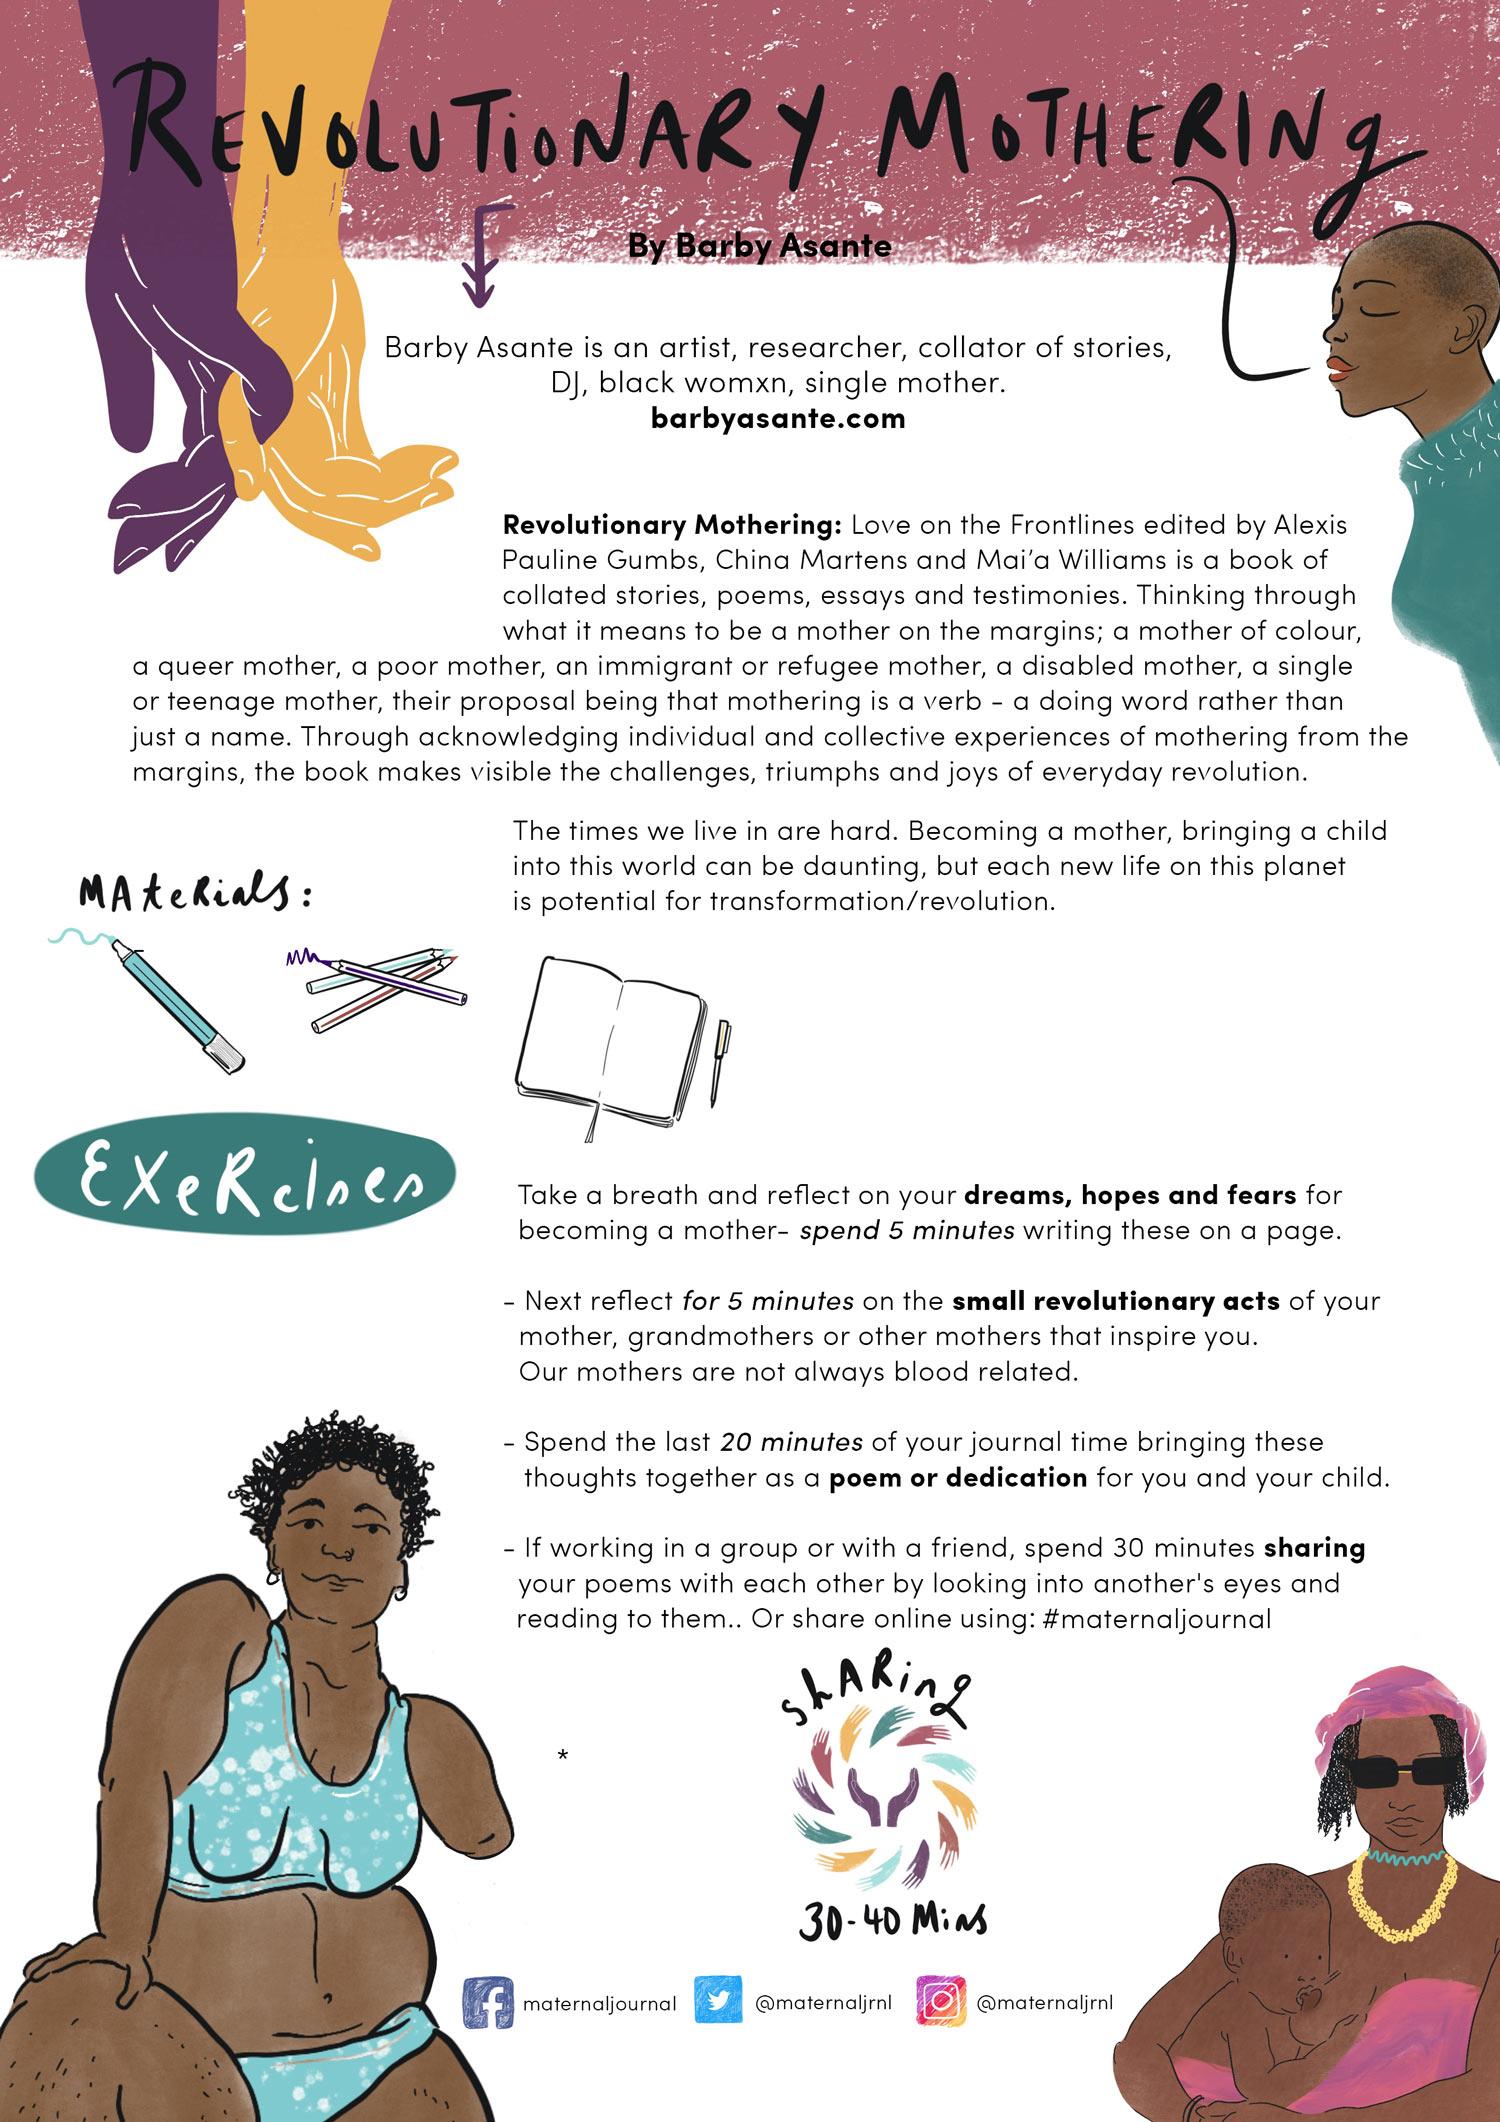 Barby-Asante_Revolutionary_Mothering_Maternal Journal.jpg